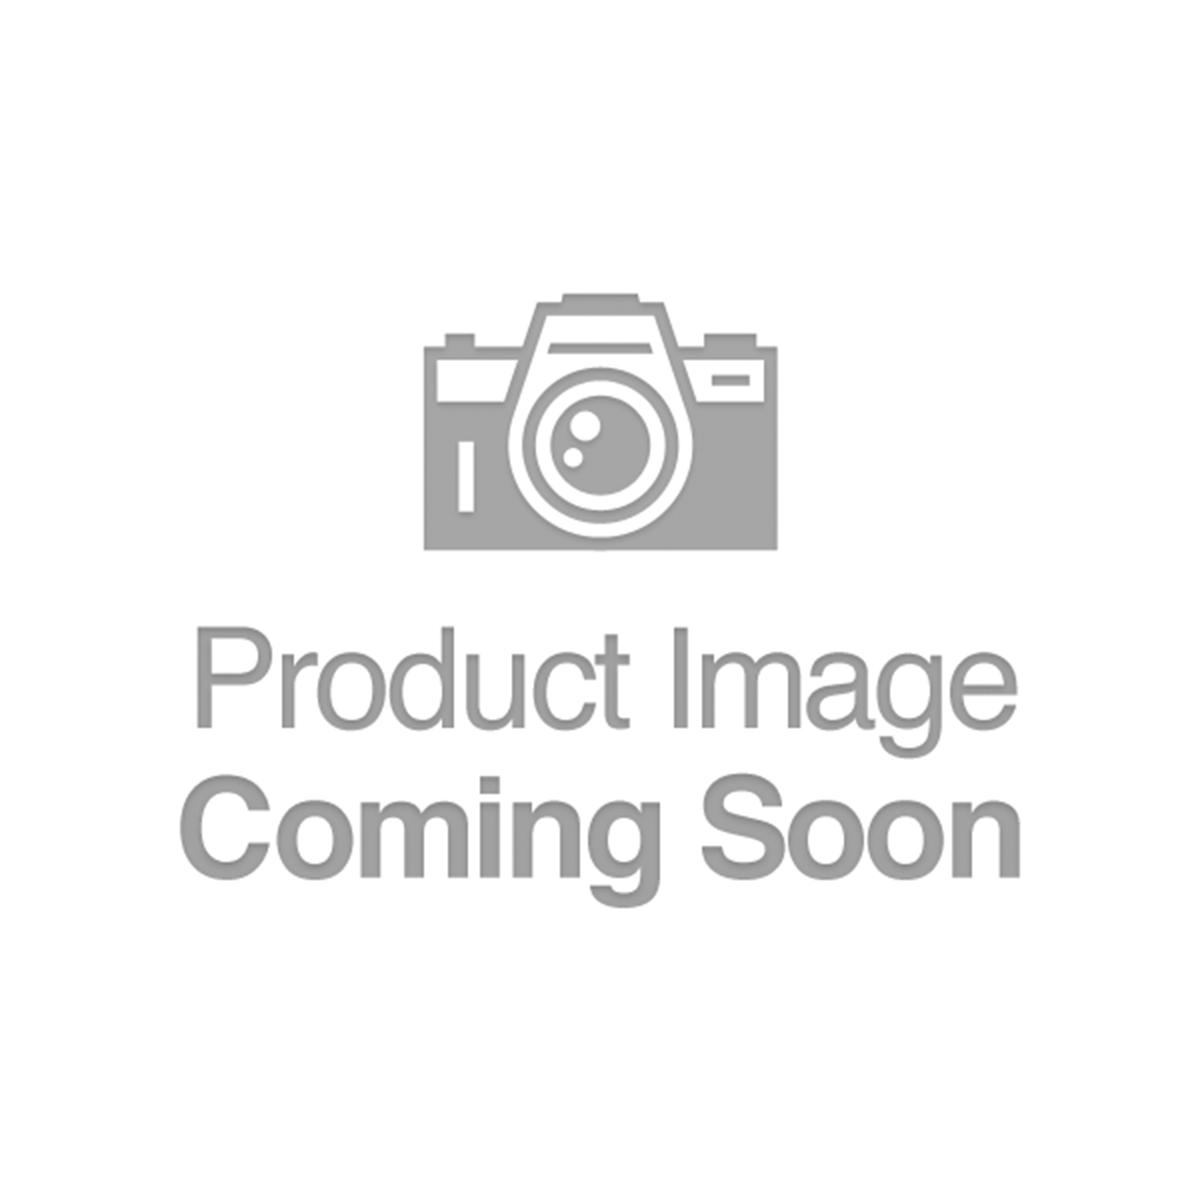 Norton - Virginia - CH 9746 - FR 1801-1 - PMG 65 EPQ